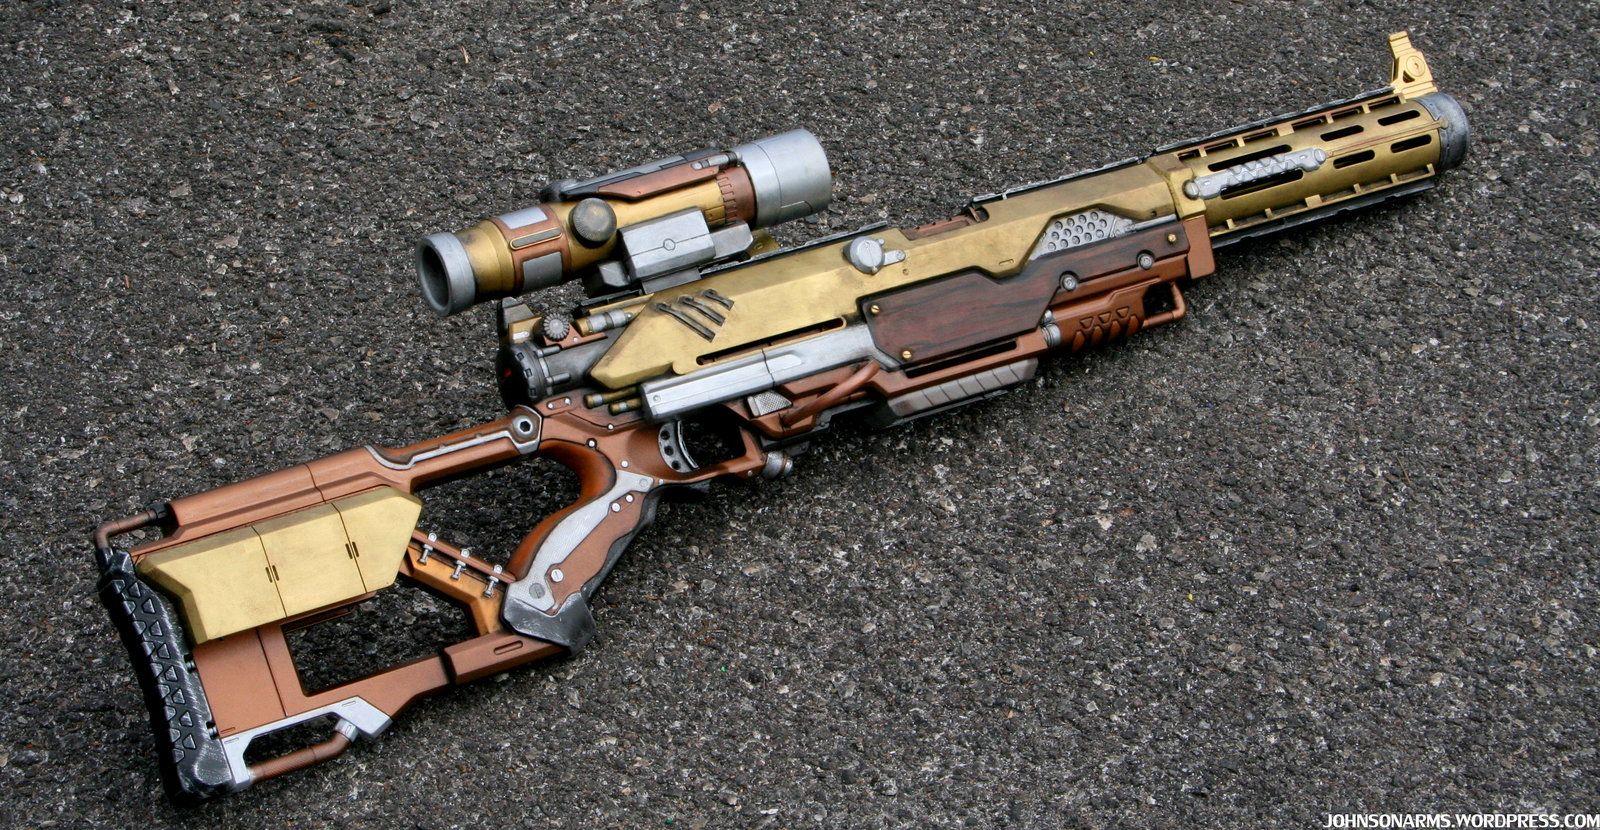 Nerf N-Strike Mission Kits nerf scope tactical light | DIY | Pinterest |  Nerf scope, Nerf gun accessories and Guns